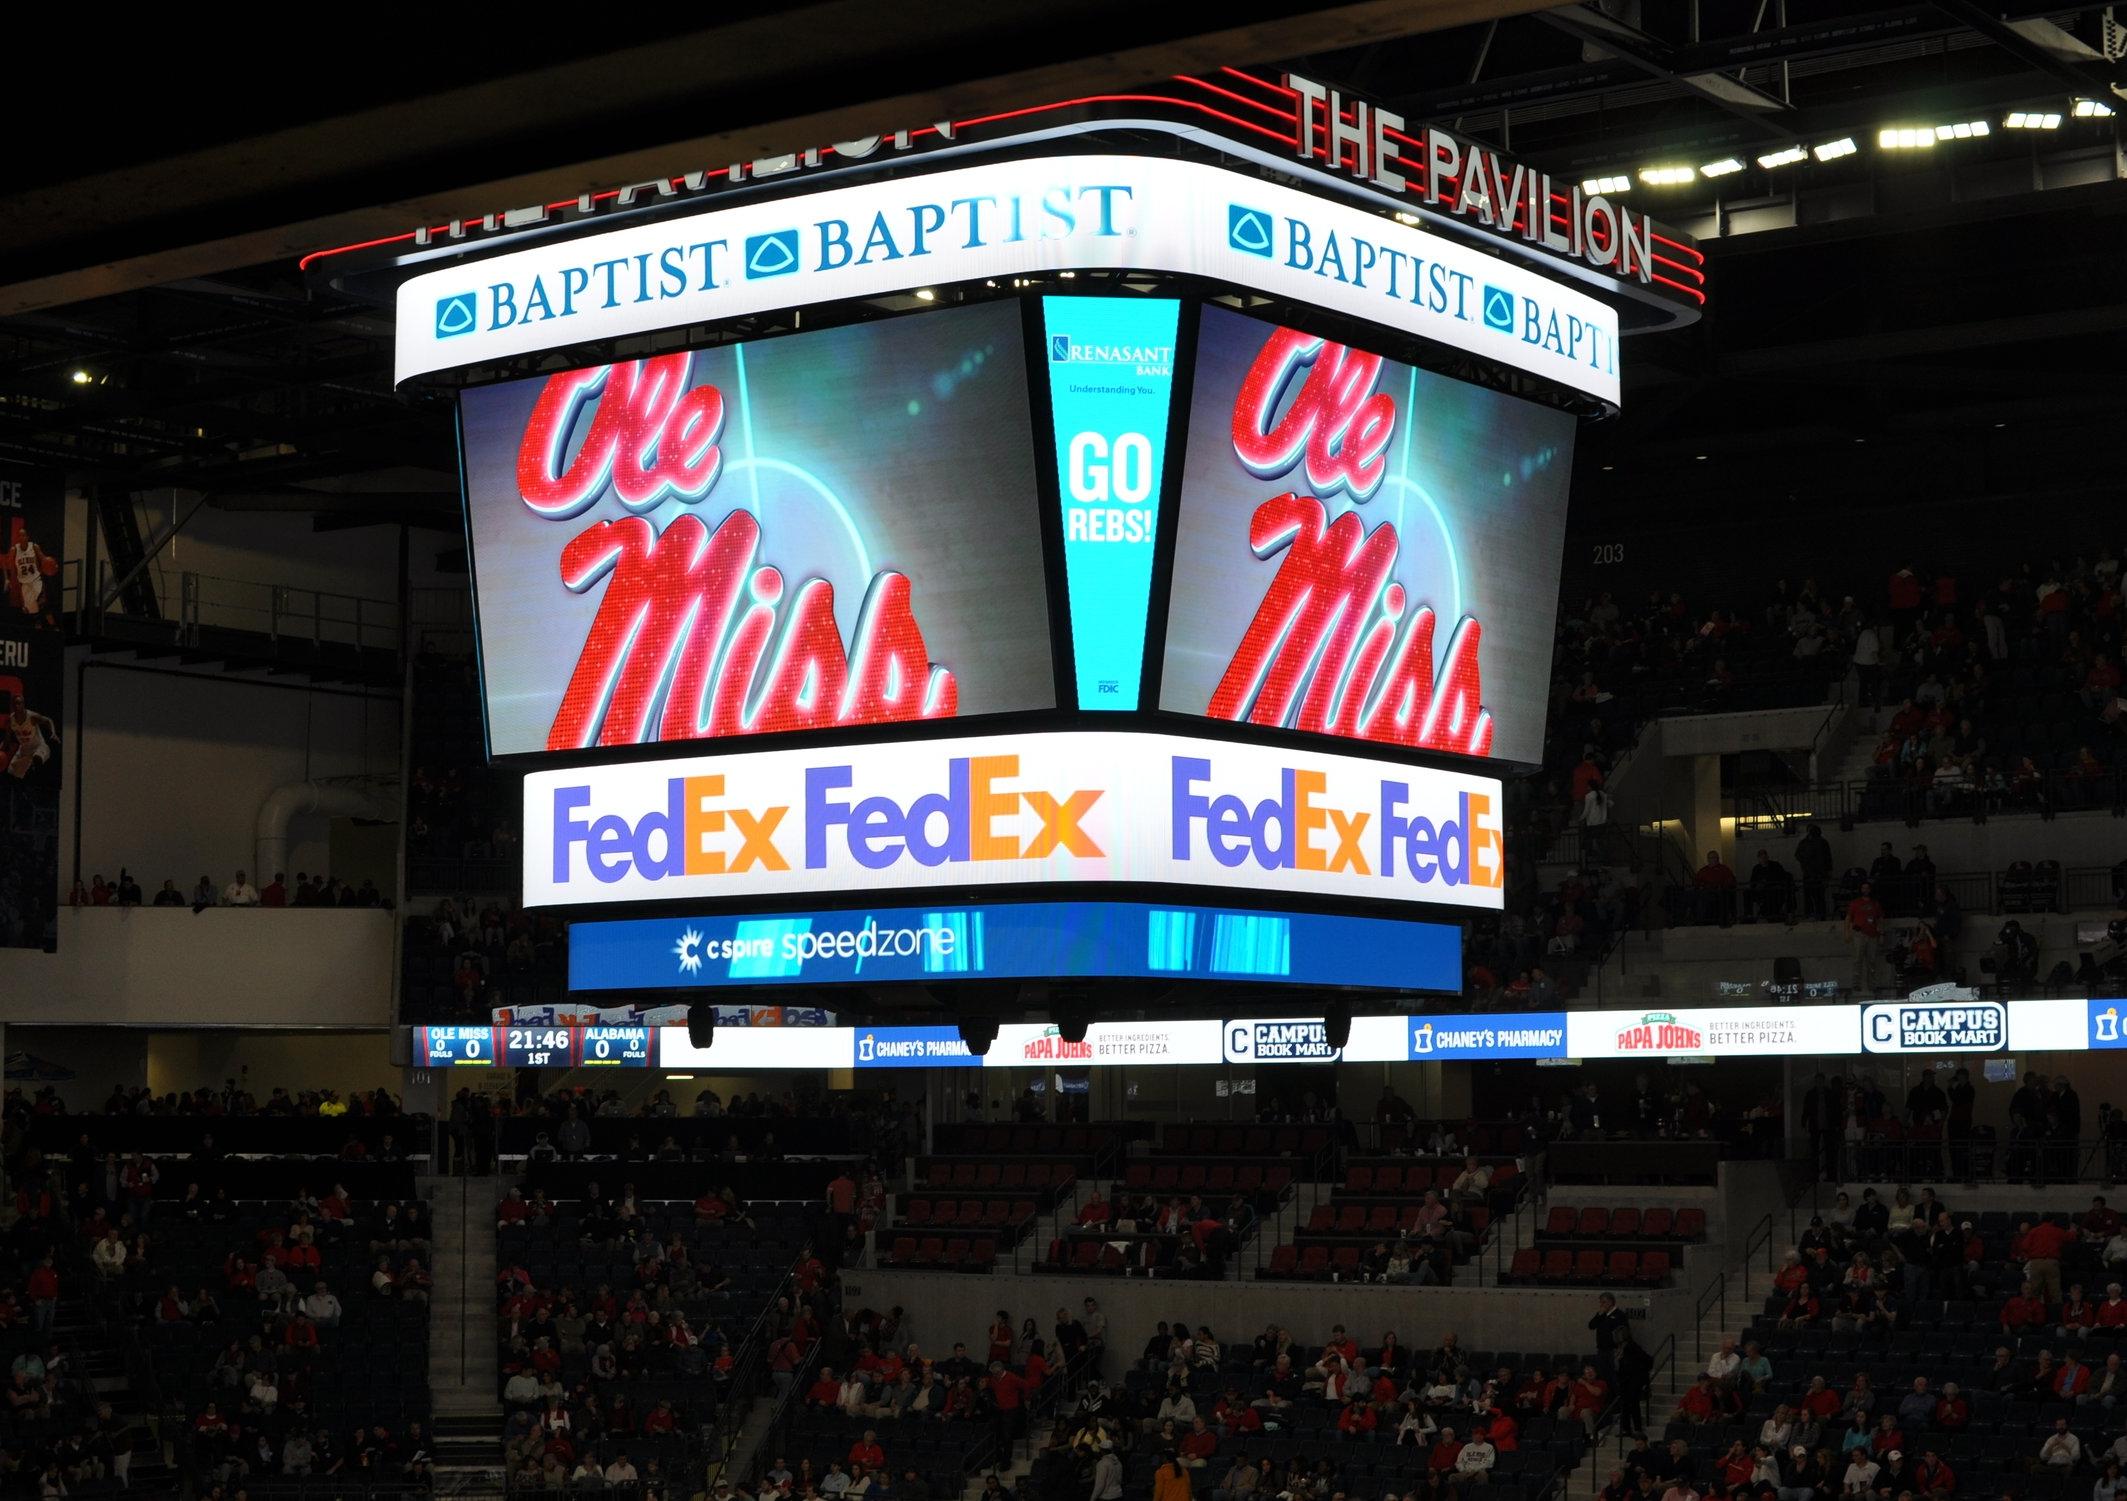 Ole Miss Pavilion -Premier Arena of the SEC